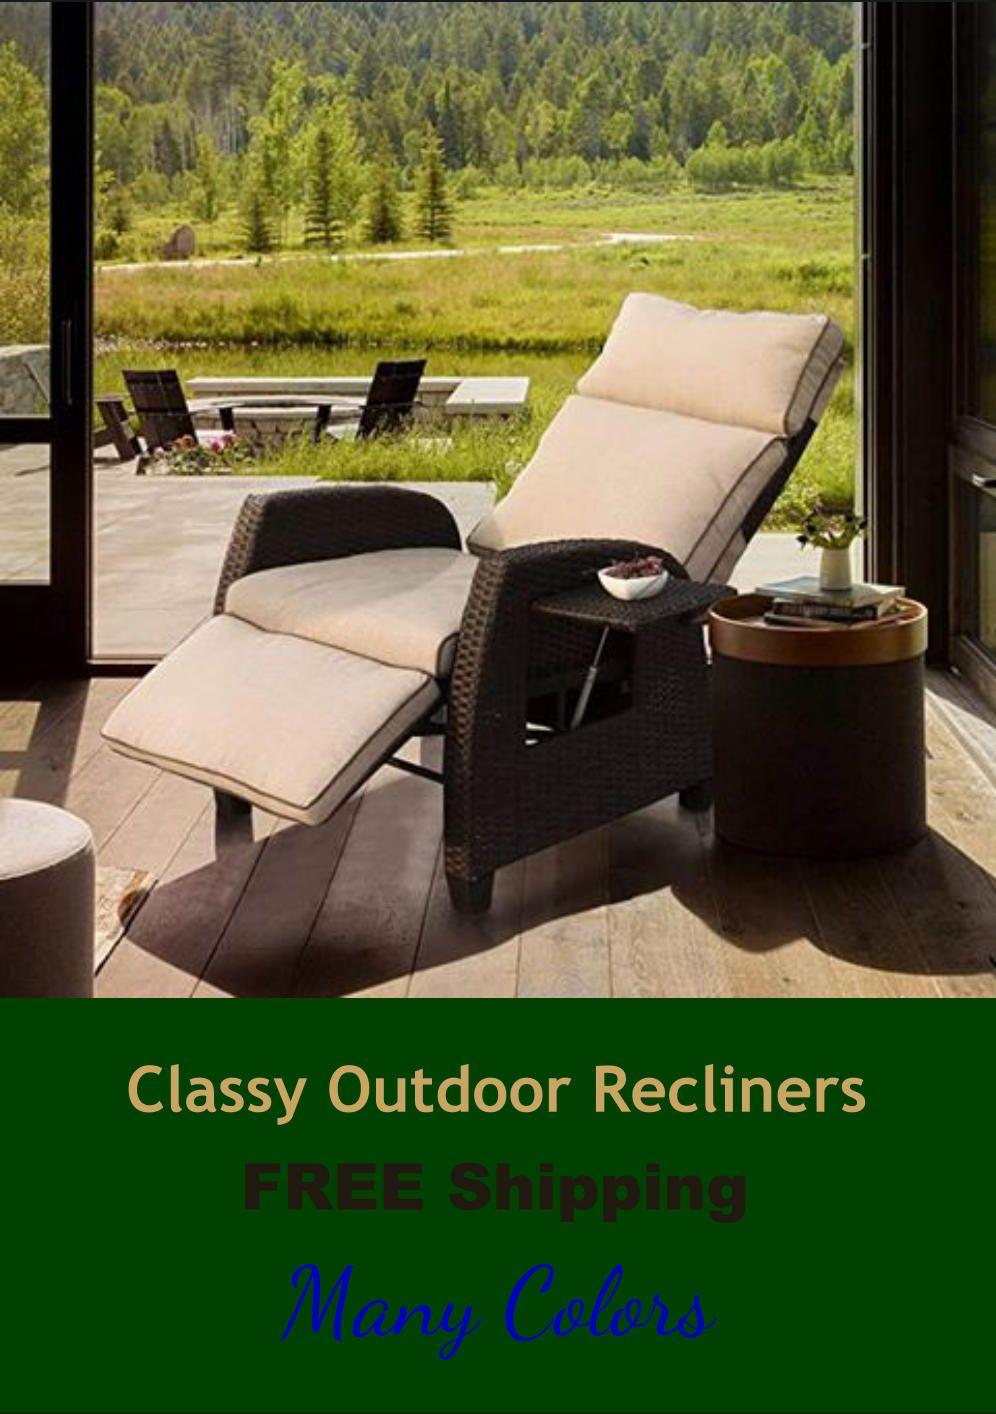 Big Outdoor Chairs Outdoor Furniture Big Man Chair In 2021 Outdoor Chairs Outdoor Recliner Custom Outdoor Furniture